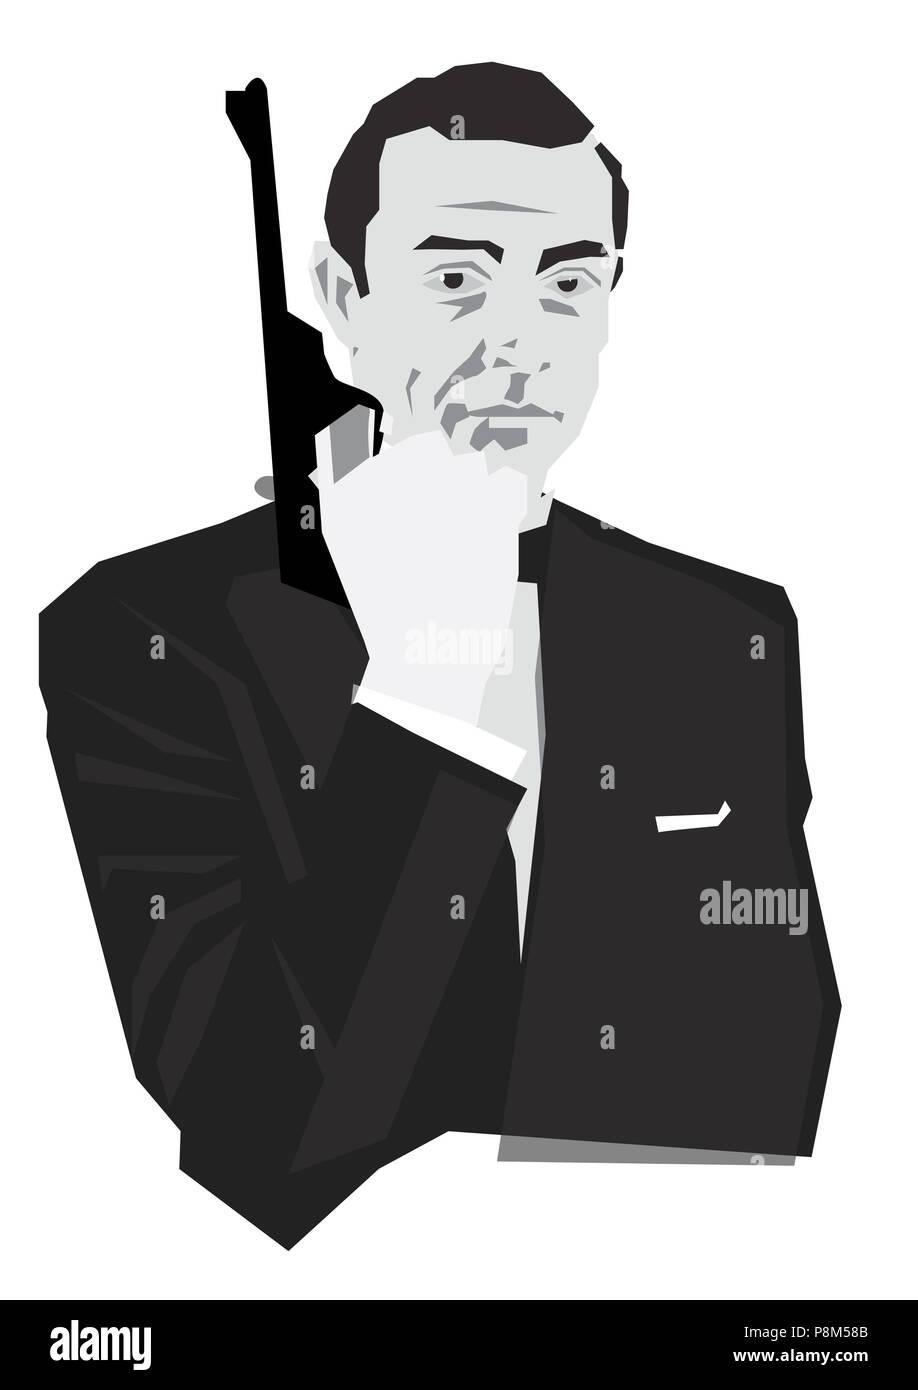 James Bond Character With Gun Stock Photo 211884859 Alamy